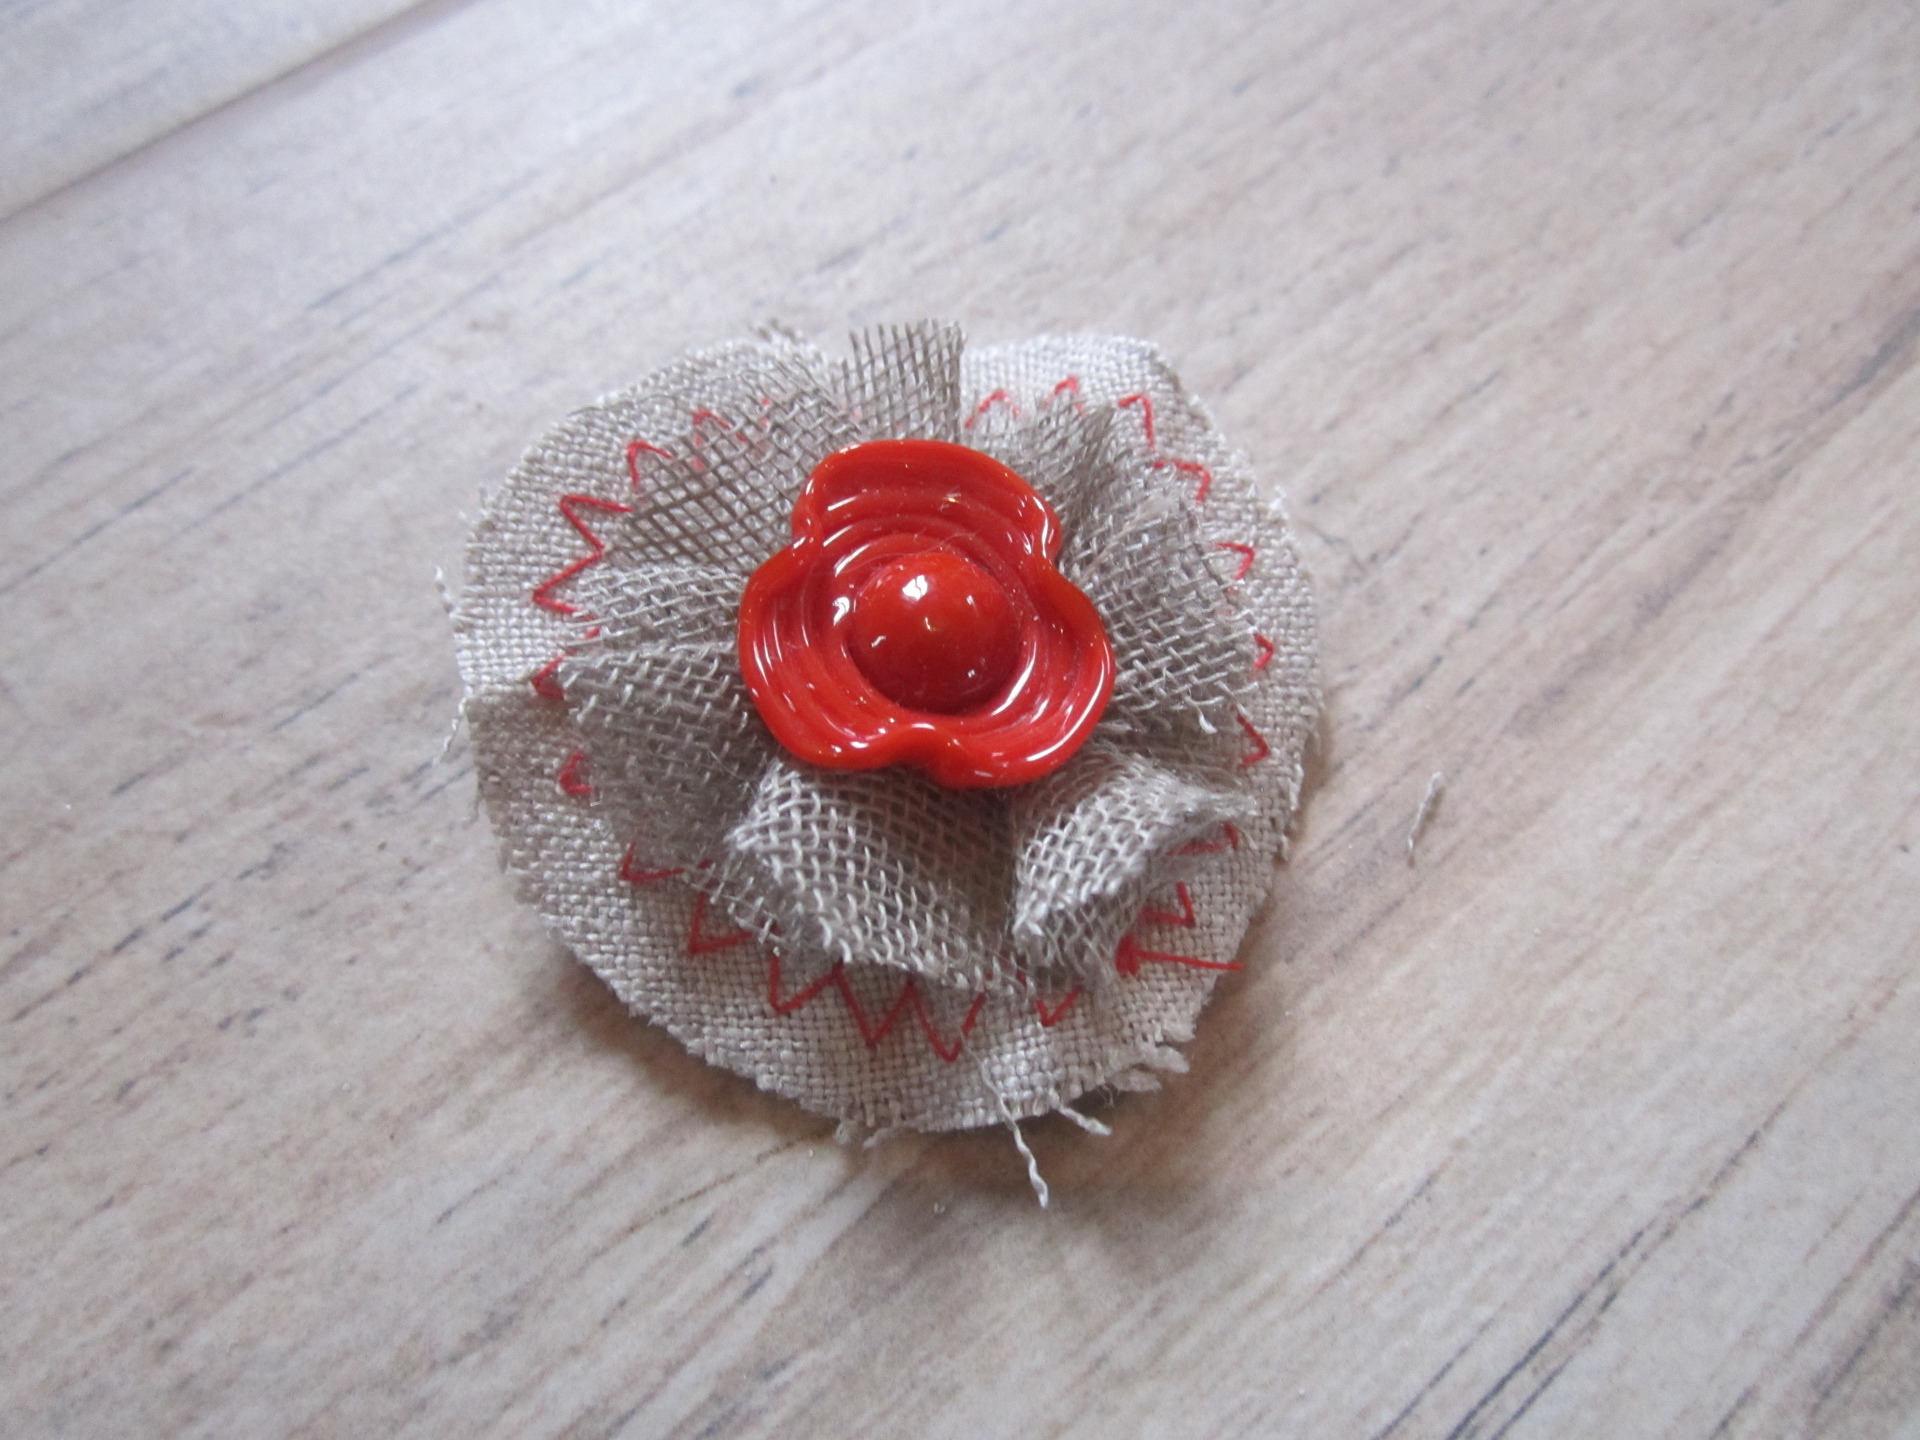 Spindle spun fabric backing Lampwork Murano glass bead